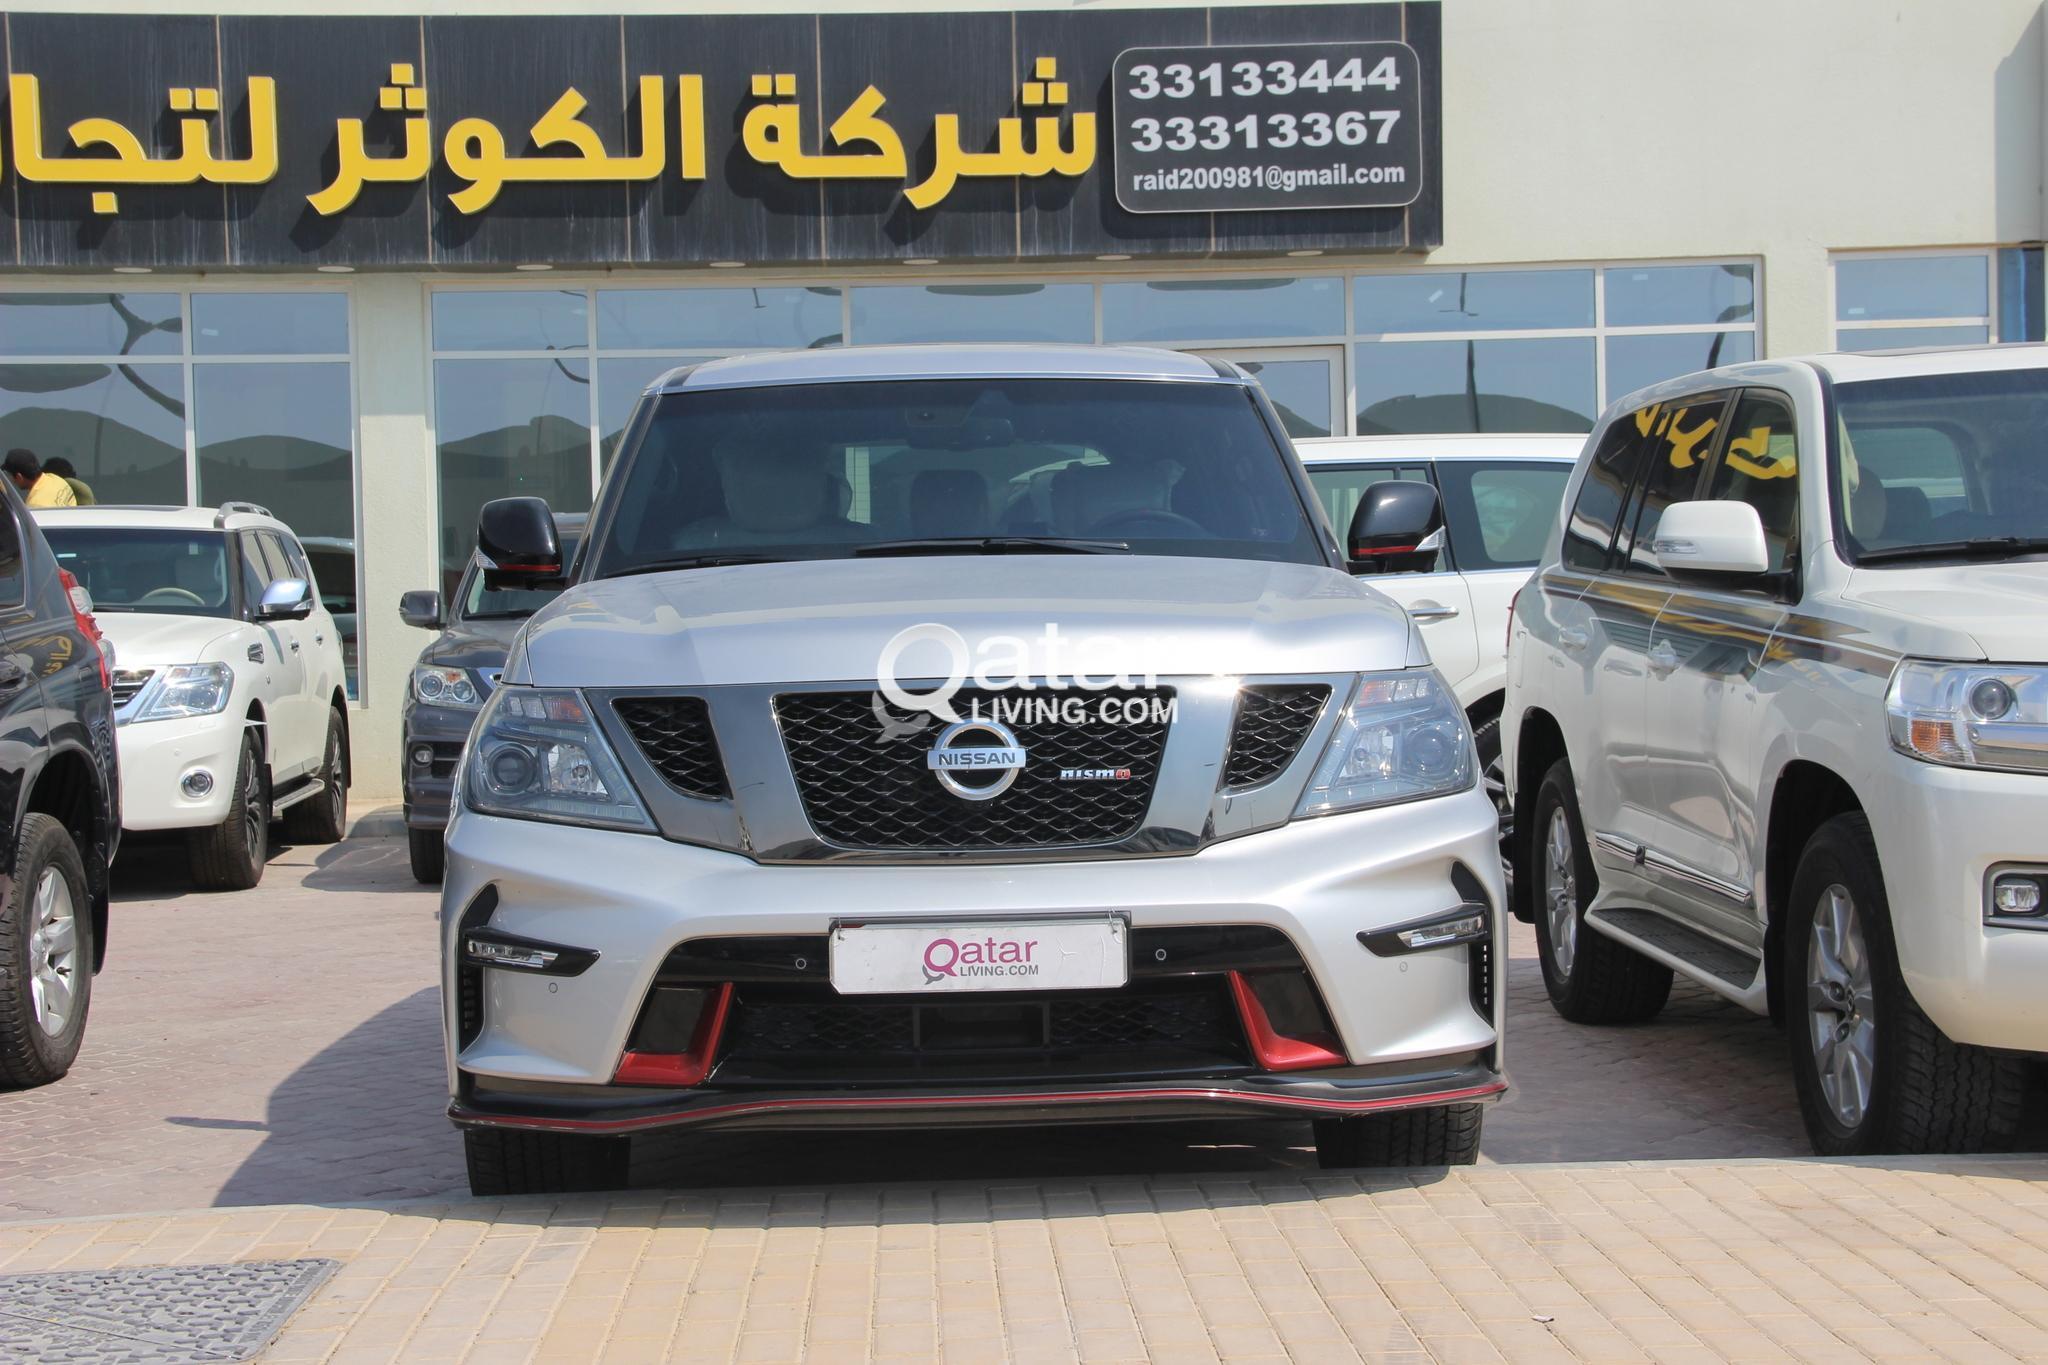 Nissan patrol nismo 2019